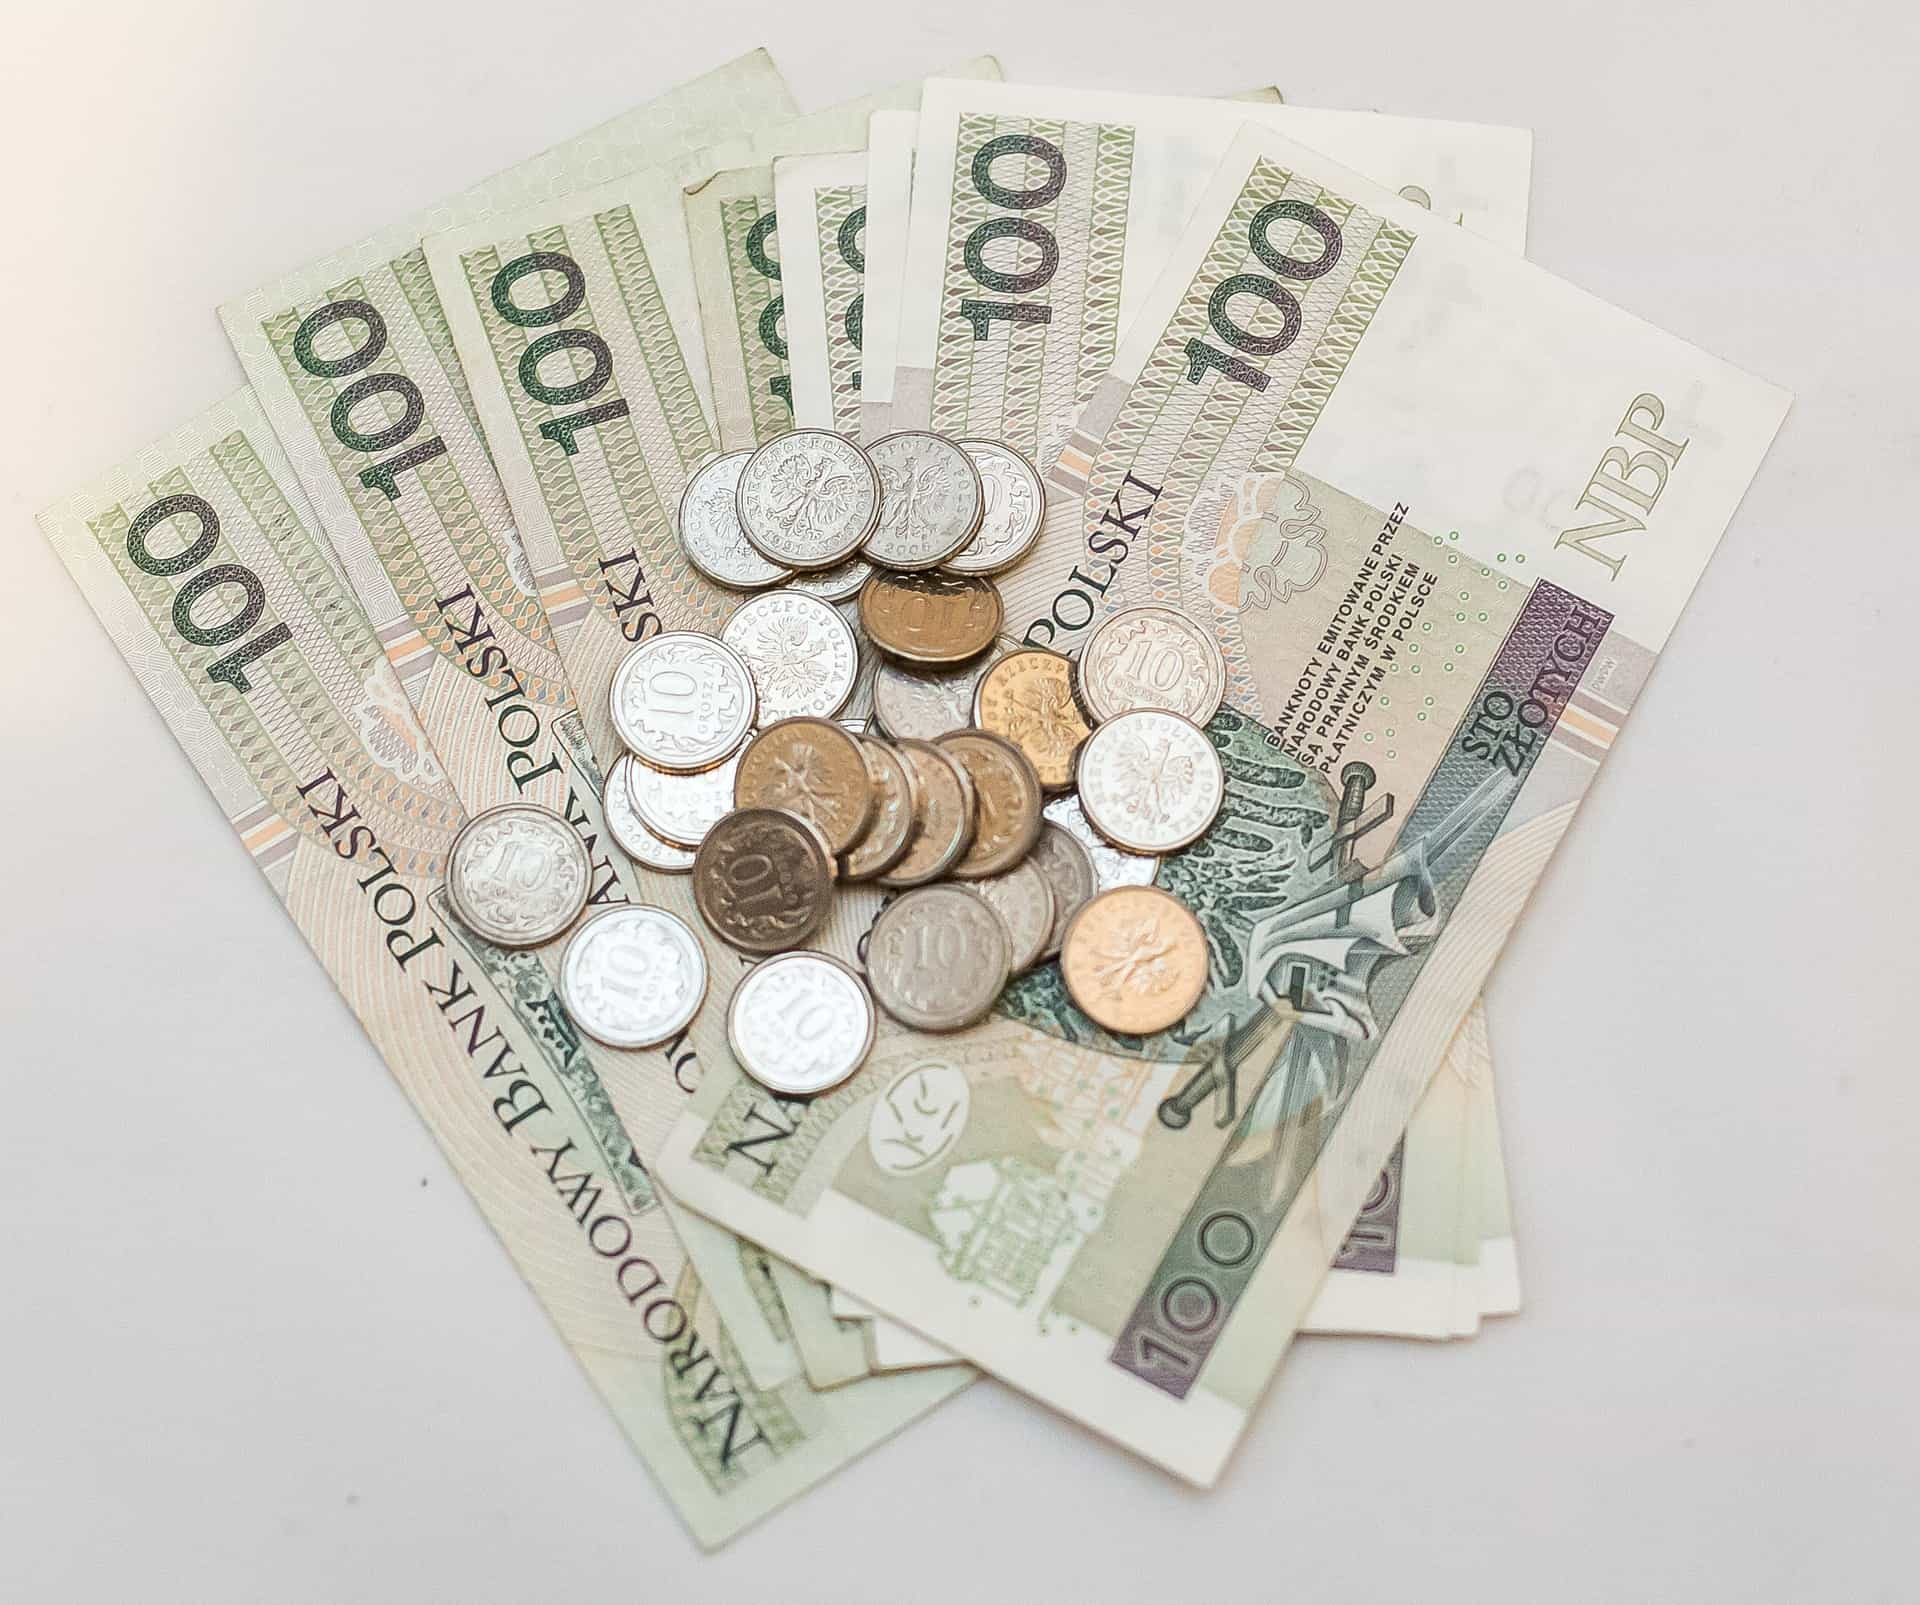 ulga za zakup kasy online